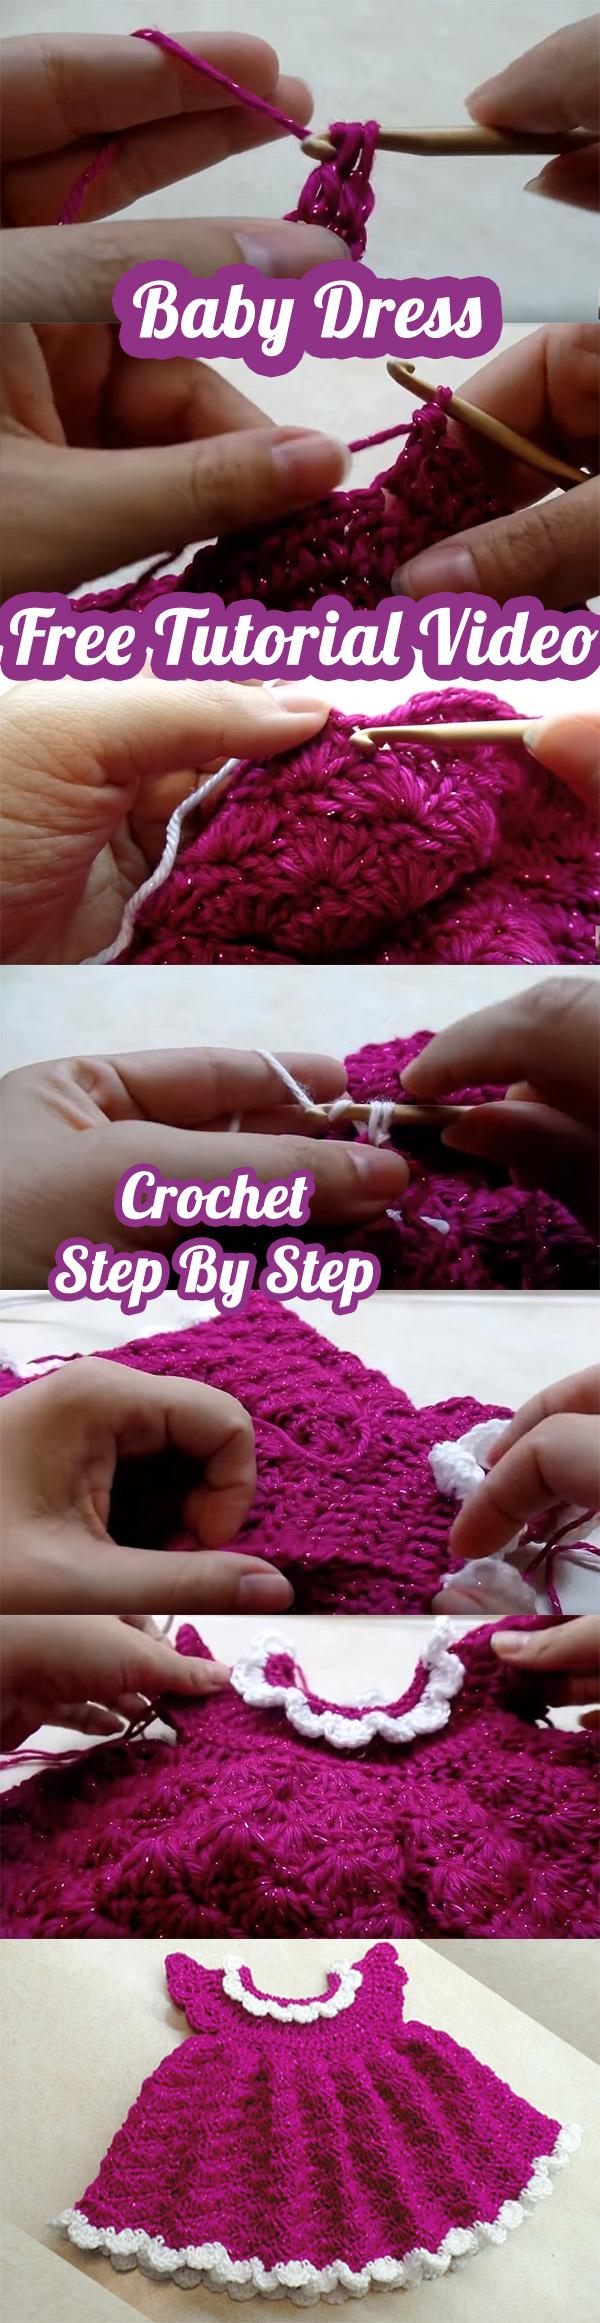 Free Crochet Baby Dress Video Tutorial